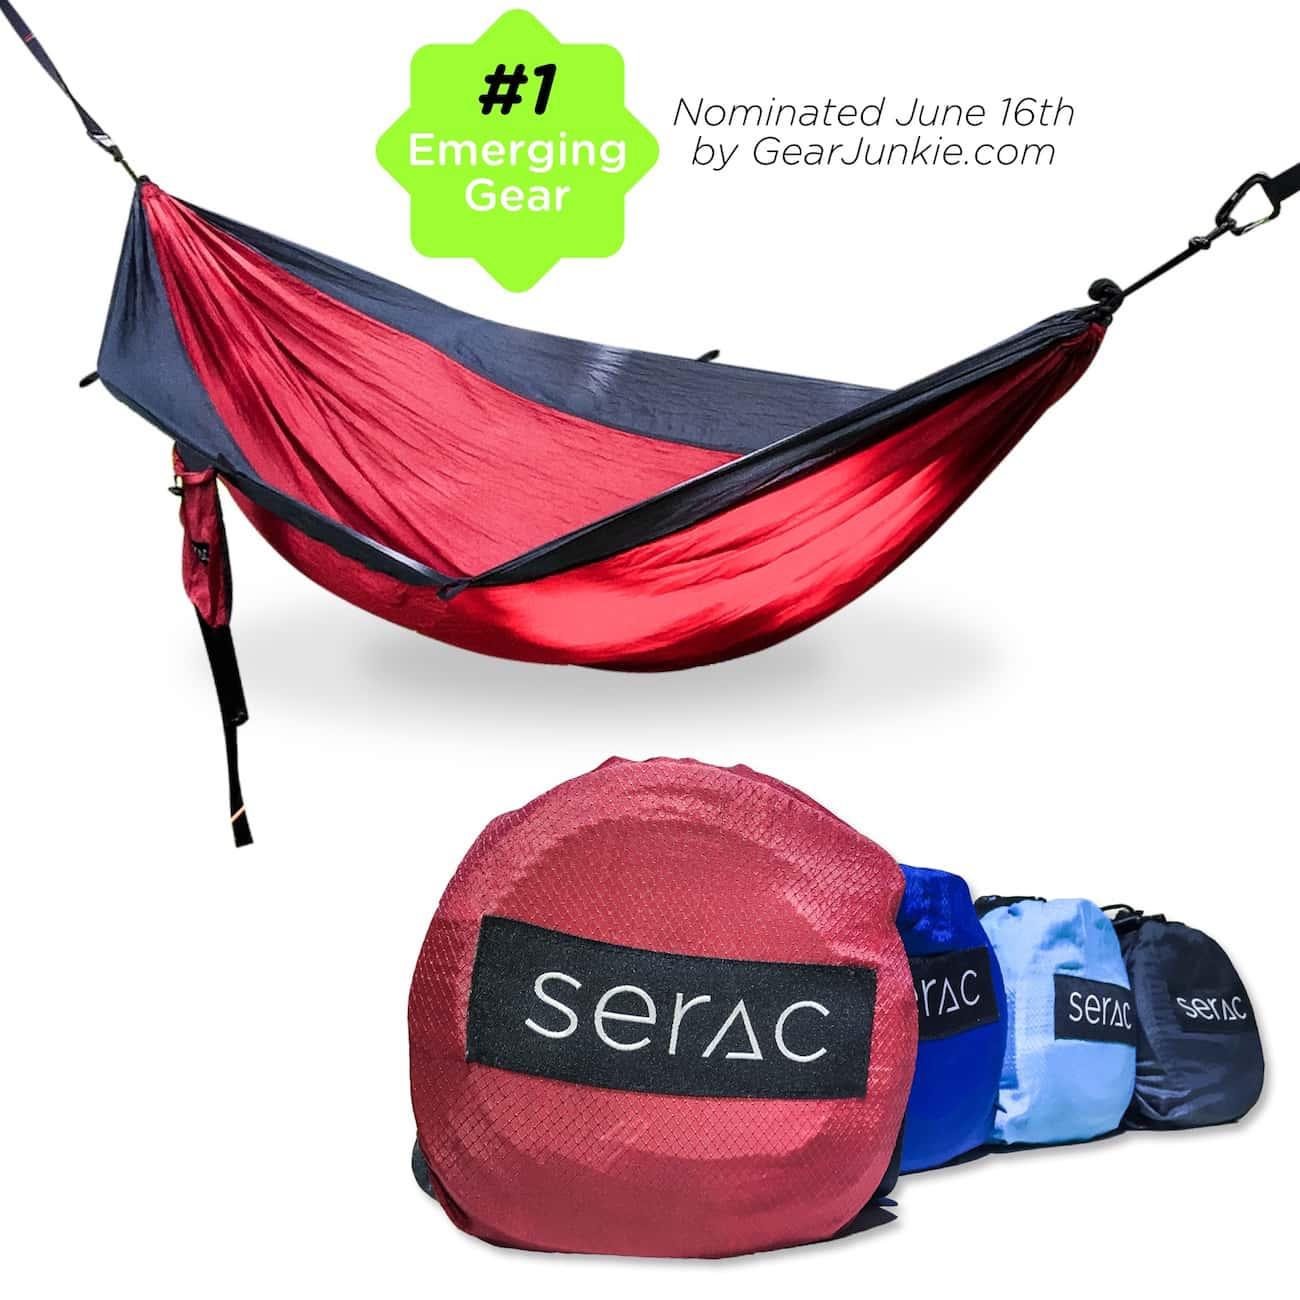 serac sequoia double camping hammock ember color with double camping hammock and compression sack